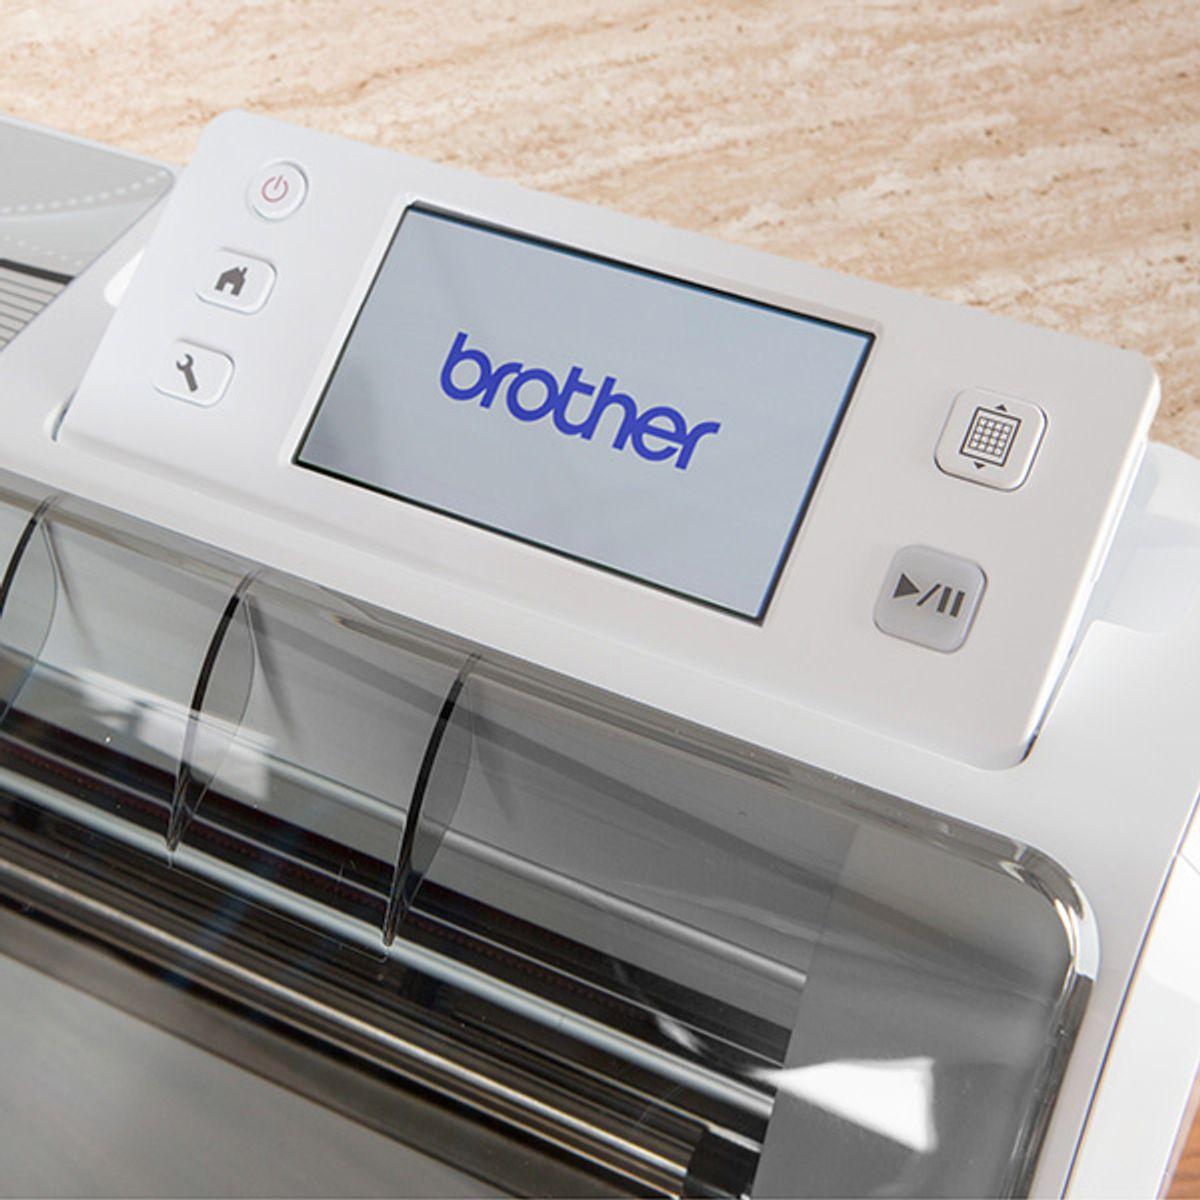 Machine ScanNCut CM300 Brother